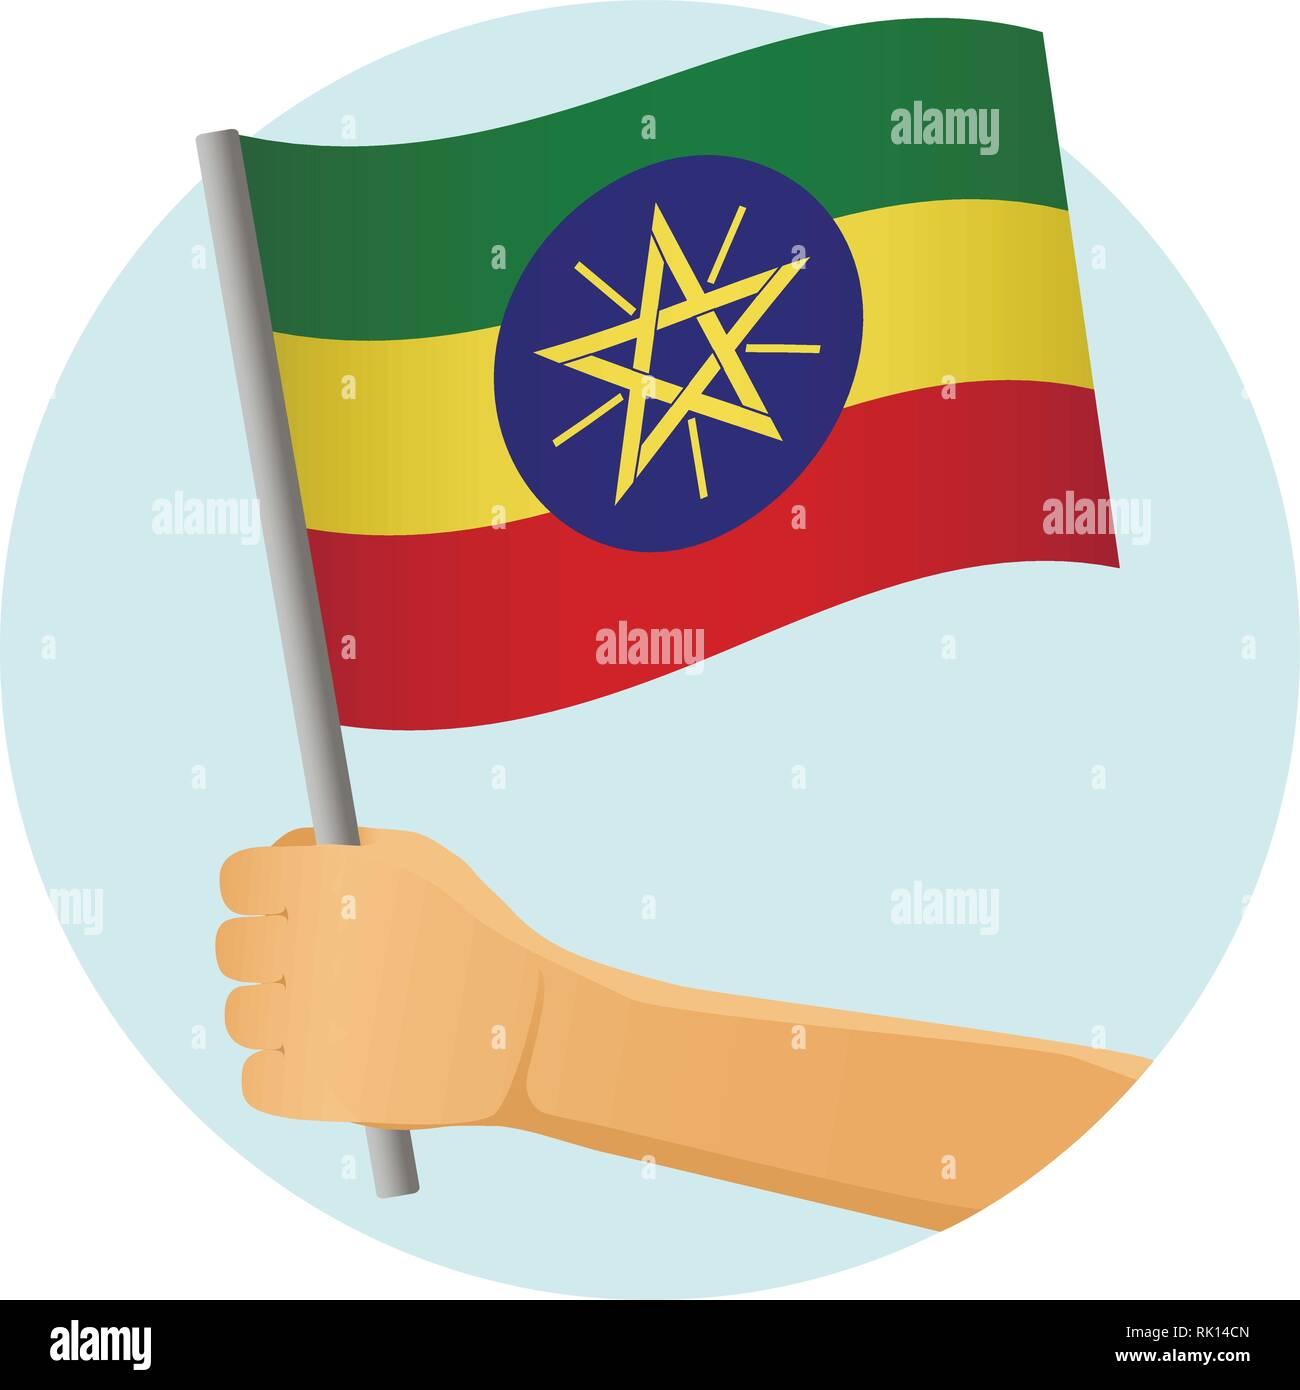 Ethiopia flag in hand. Patriotic background. National flag of Ethiopia vector illustration - Stock Vector